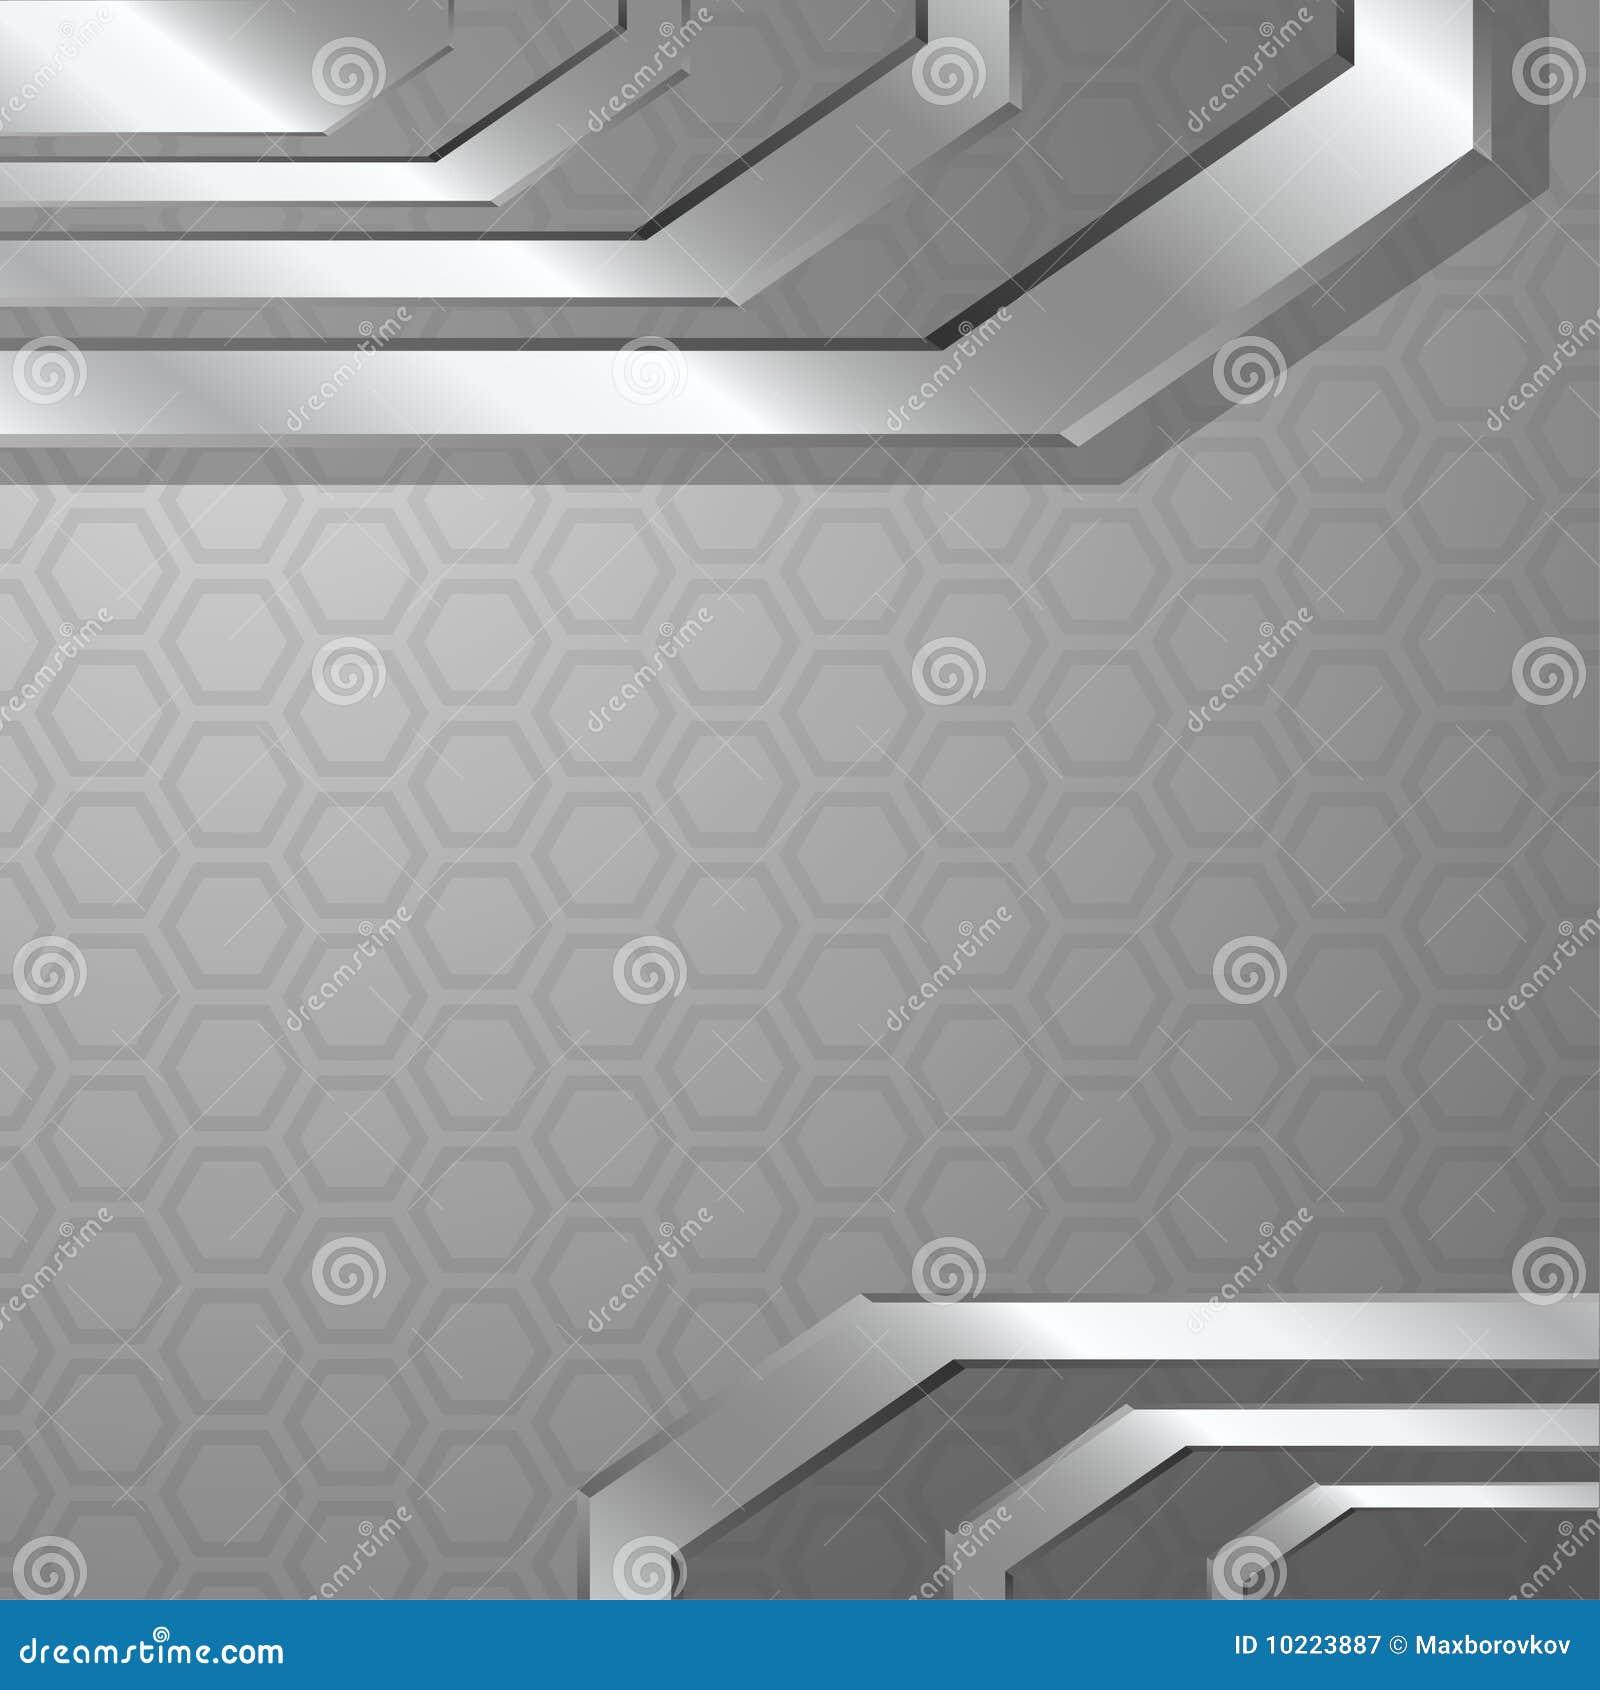 Technology background.